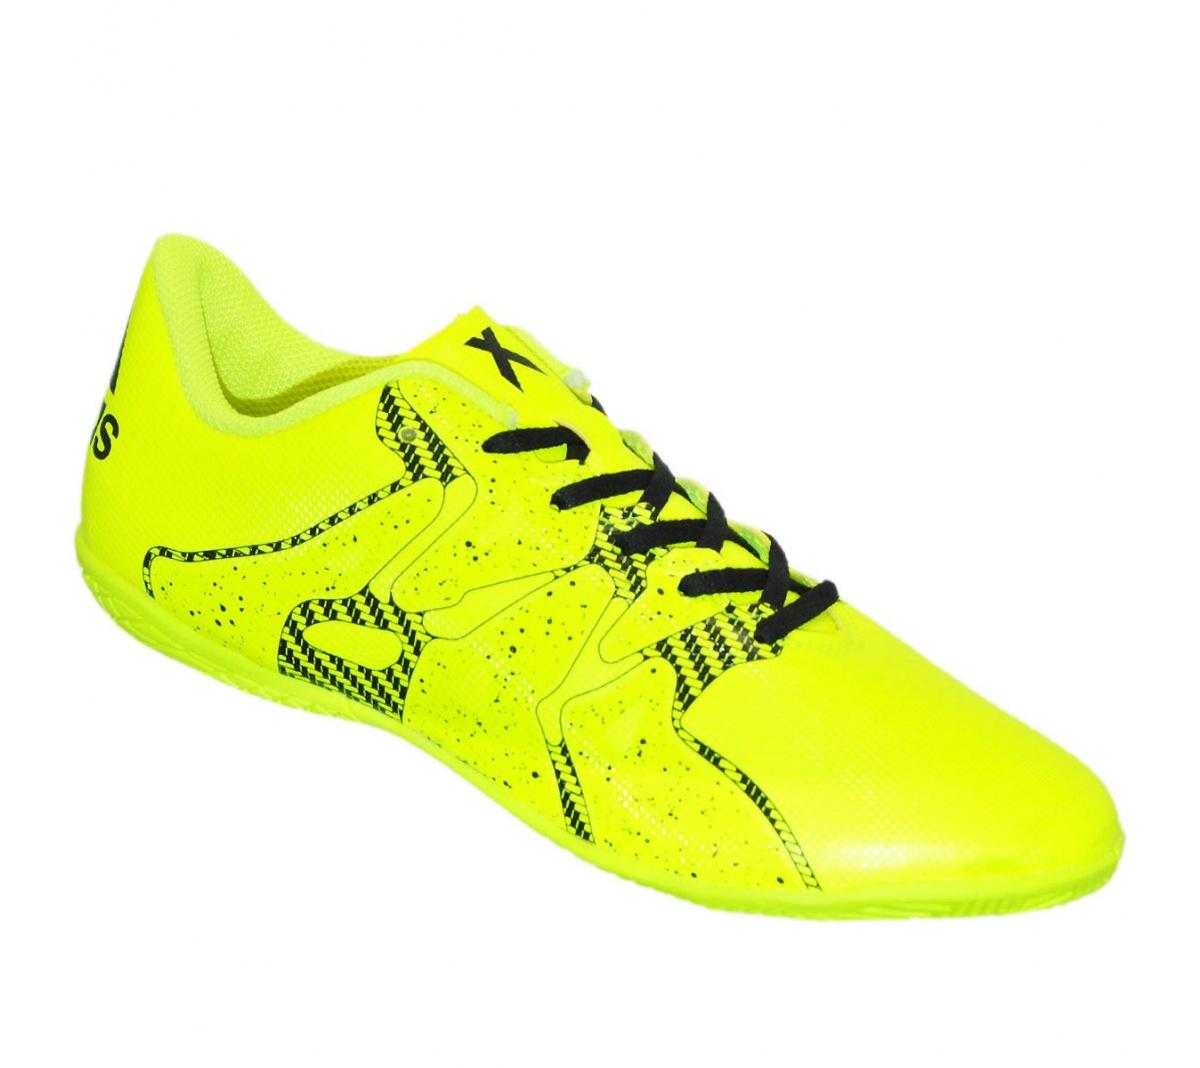 bc67d2640b2a2 Tênis Adidas X 15.4 Infantil Futsal Tênis Adidas X 15.4 Infantil Futsal ...